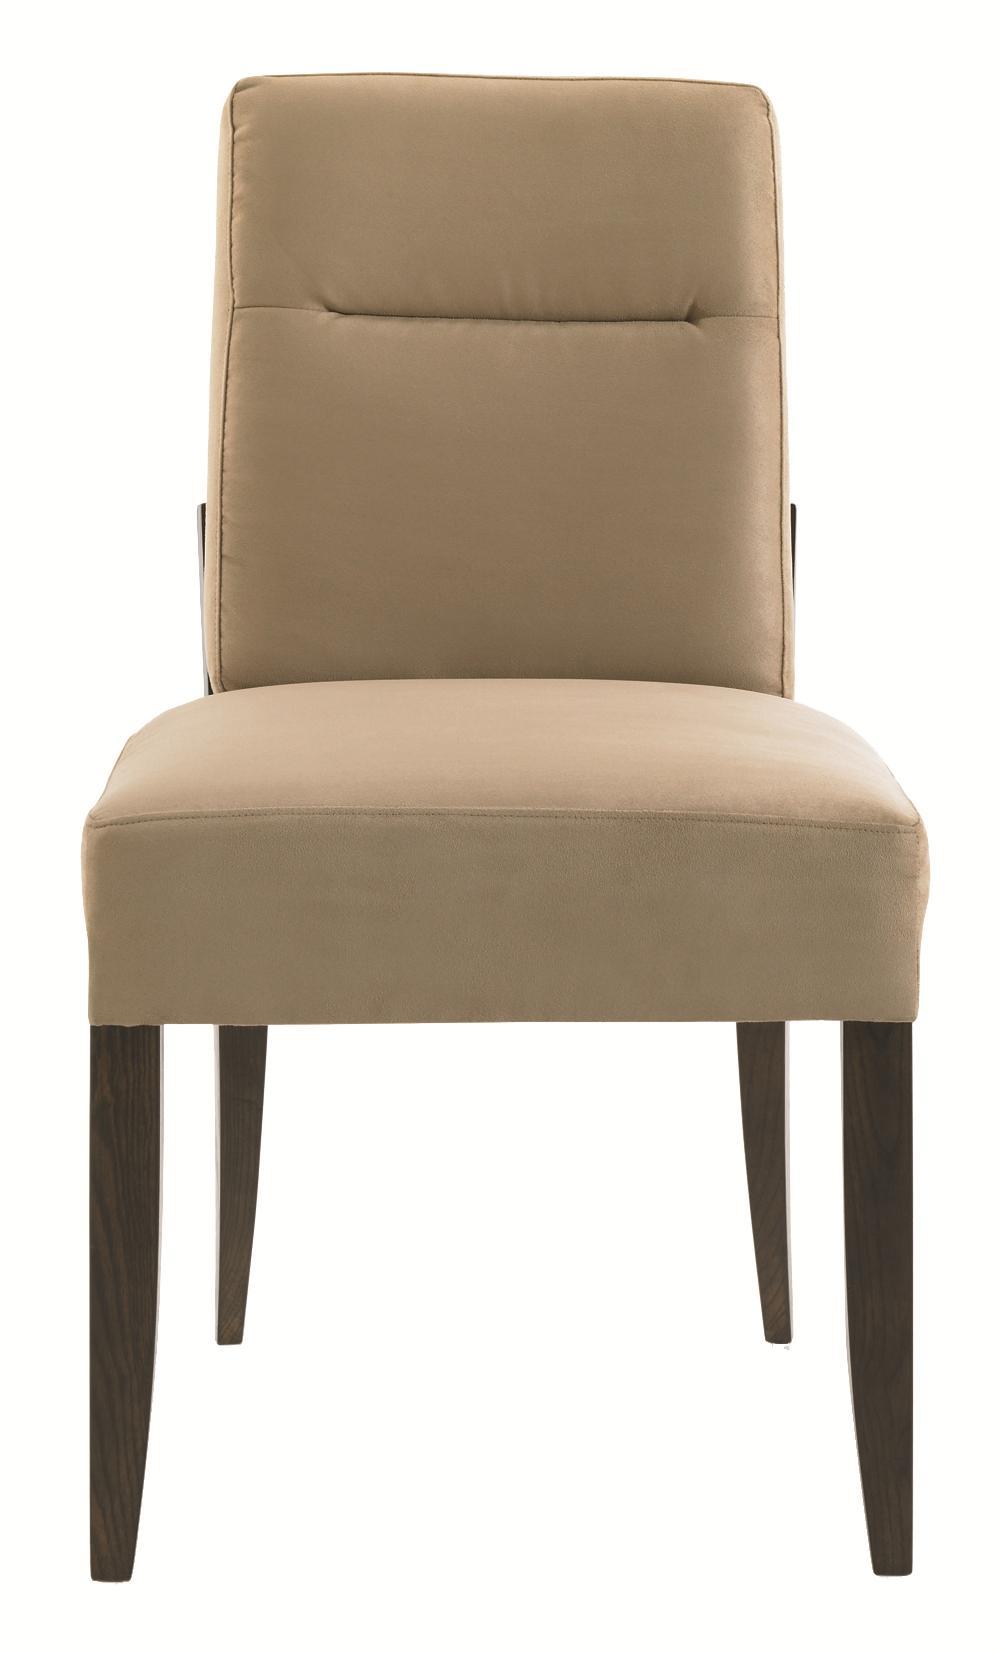 Schnadig Modern Artisan Craftsmen Side Chair - Item Number: ATS-SIDCHA-005